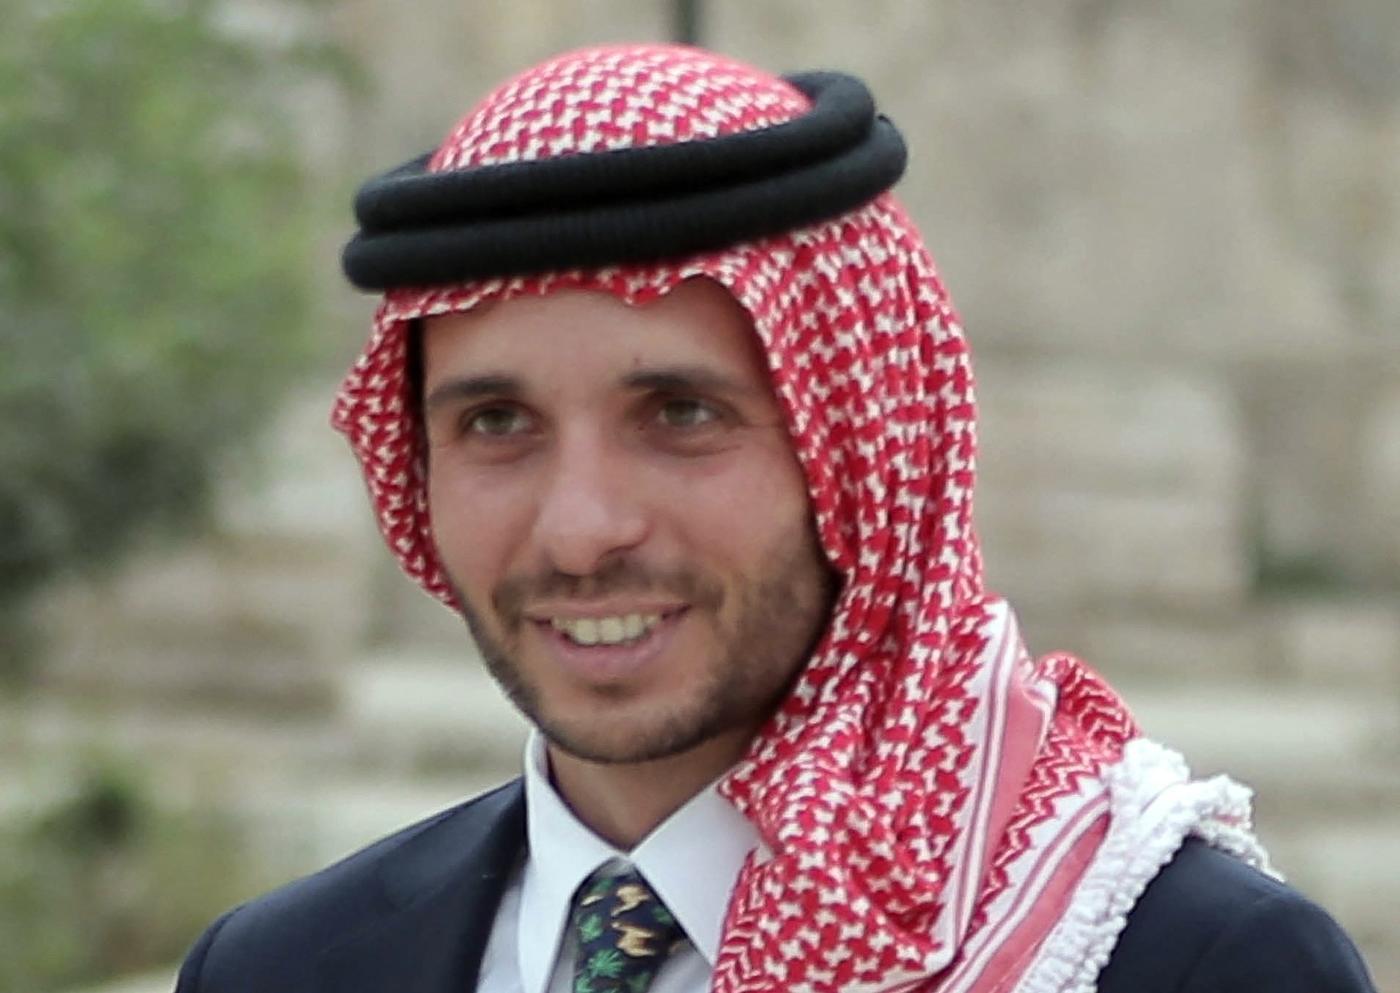 Jordan's Prince Hamzah in new recording: 'I will not obey'